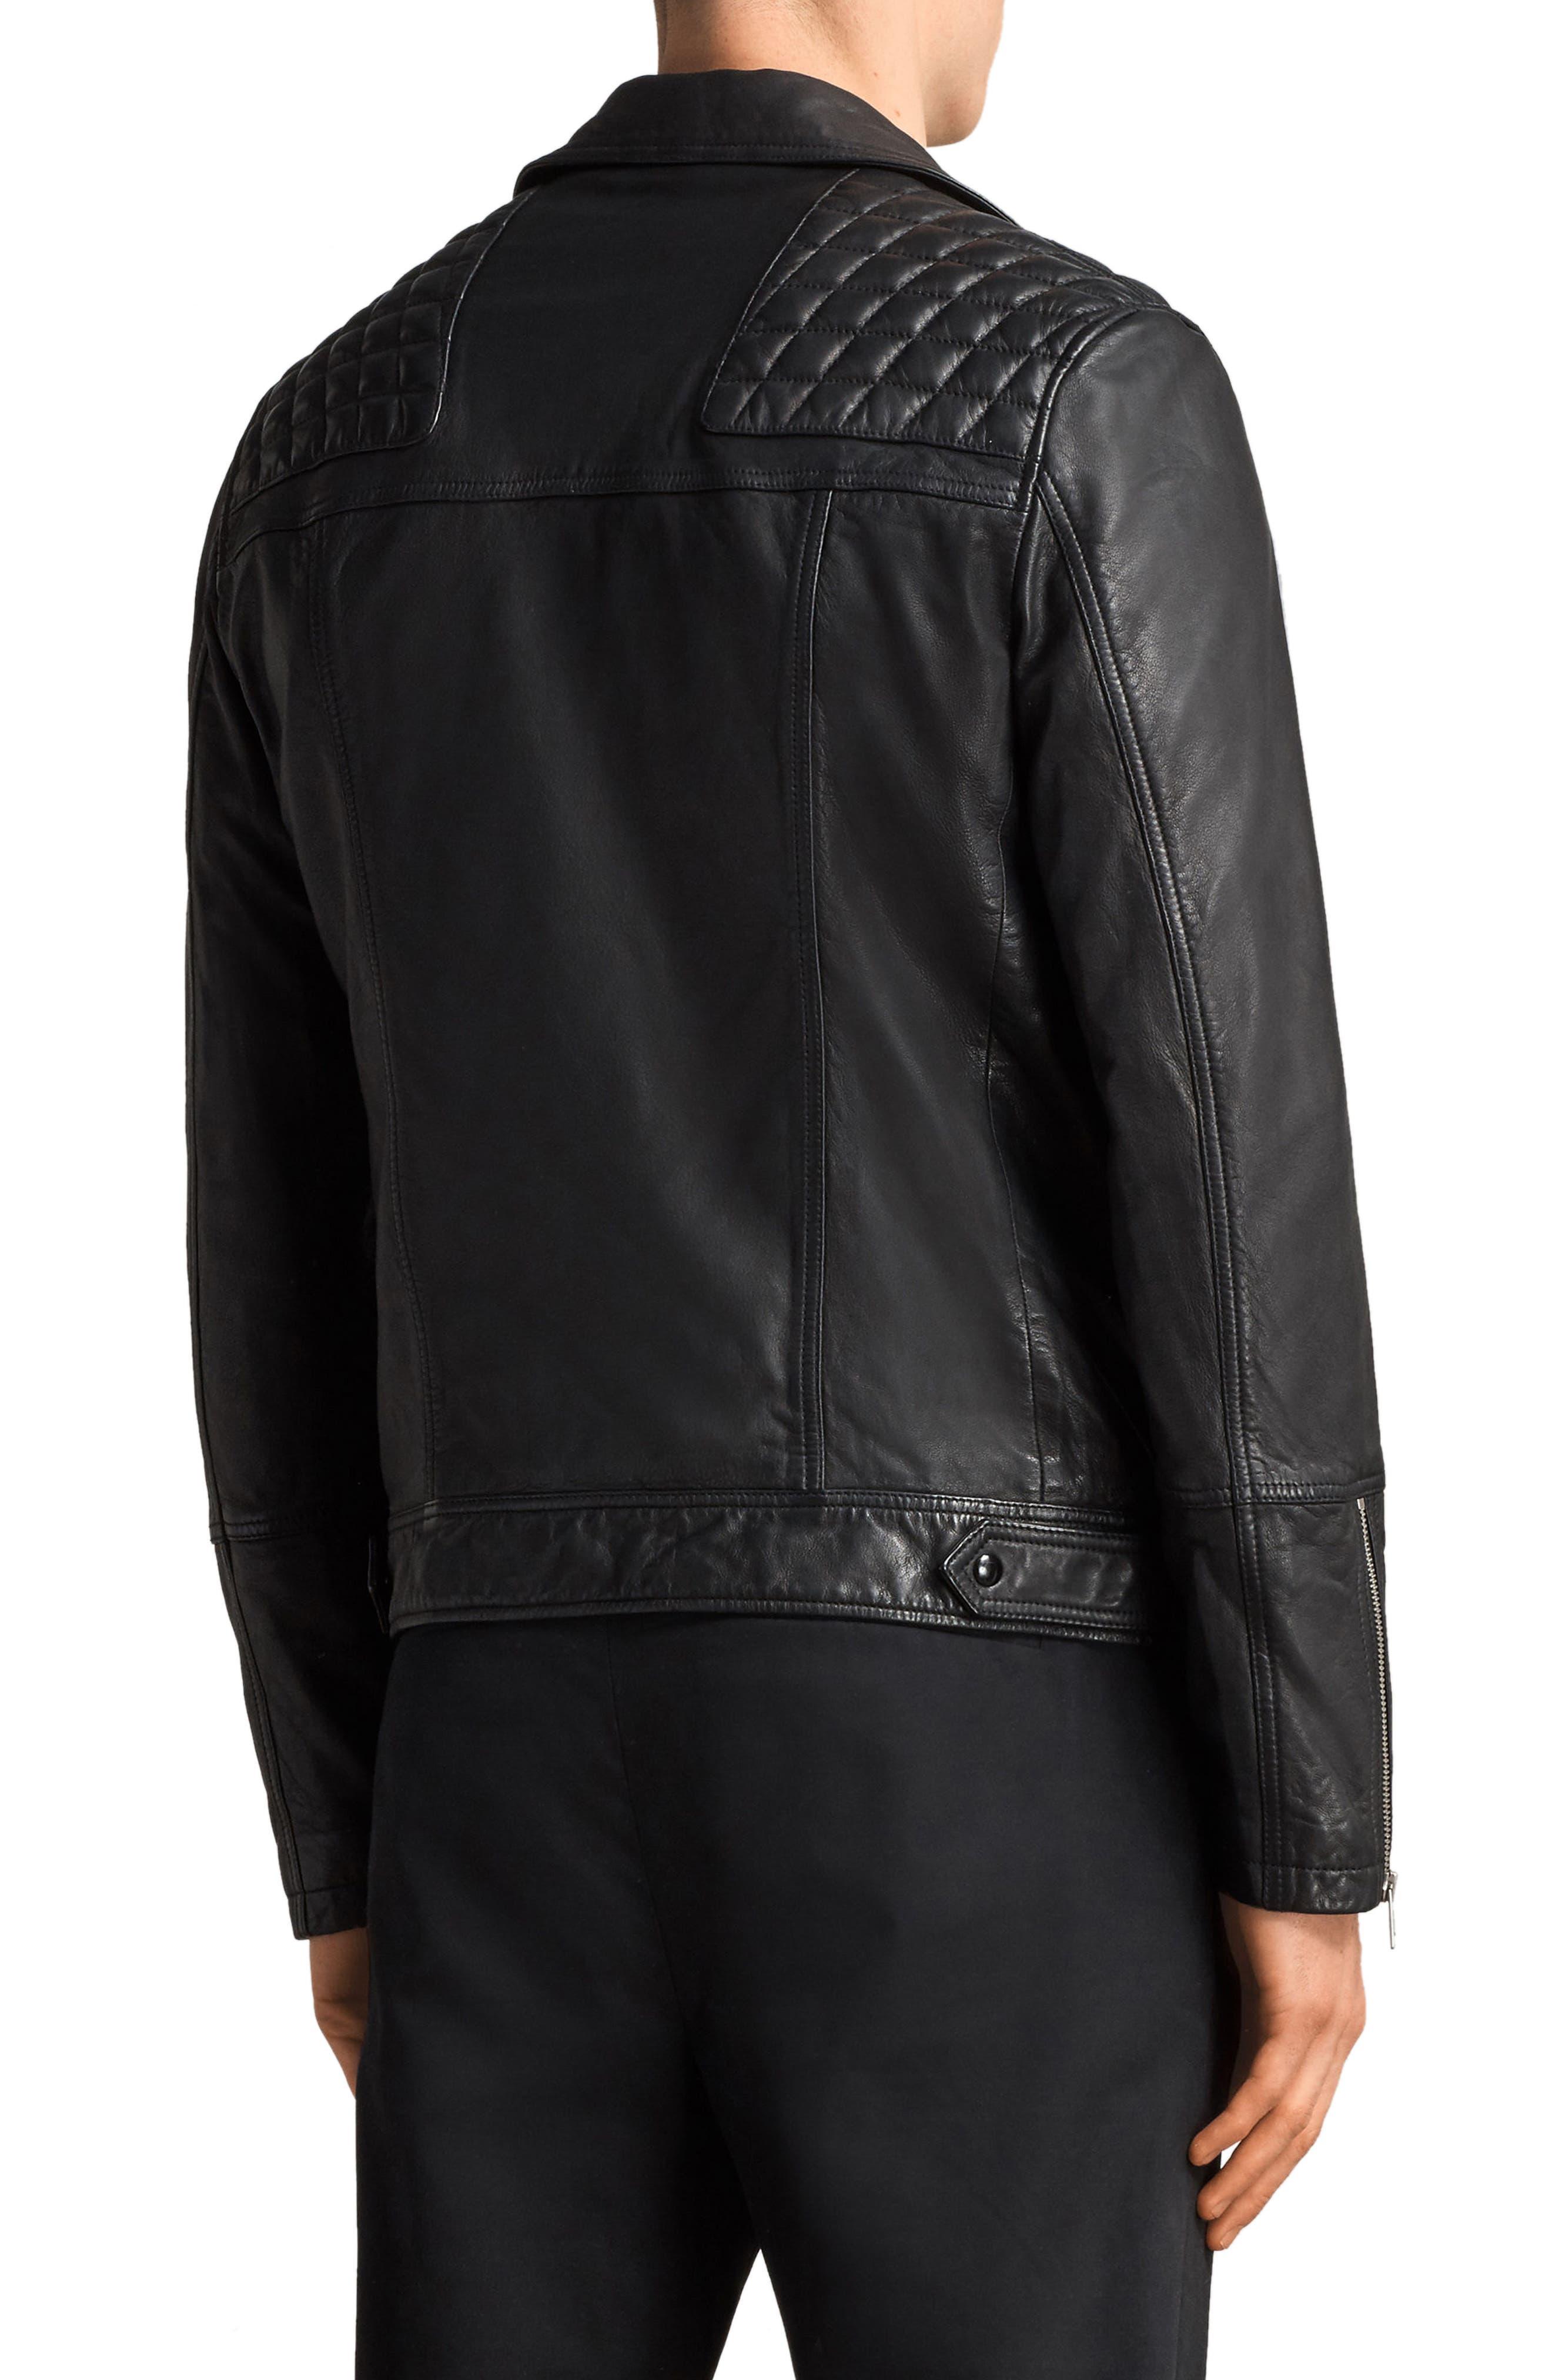 Taro Slim Fit Leather Biker Jacket,                             Alternate thumbnail 2, color,                             001